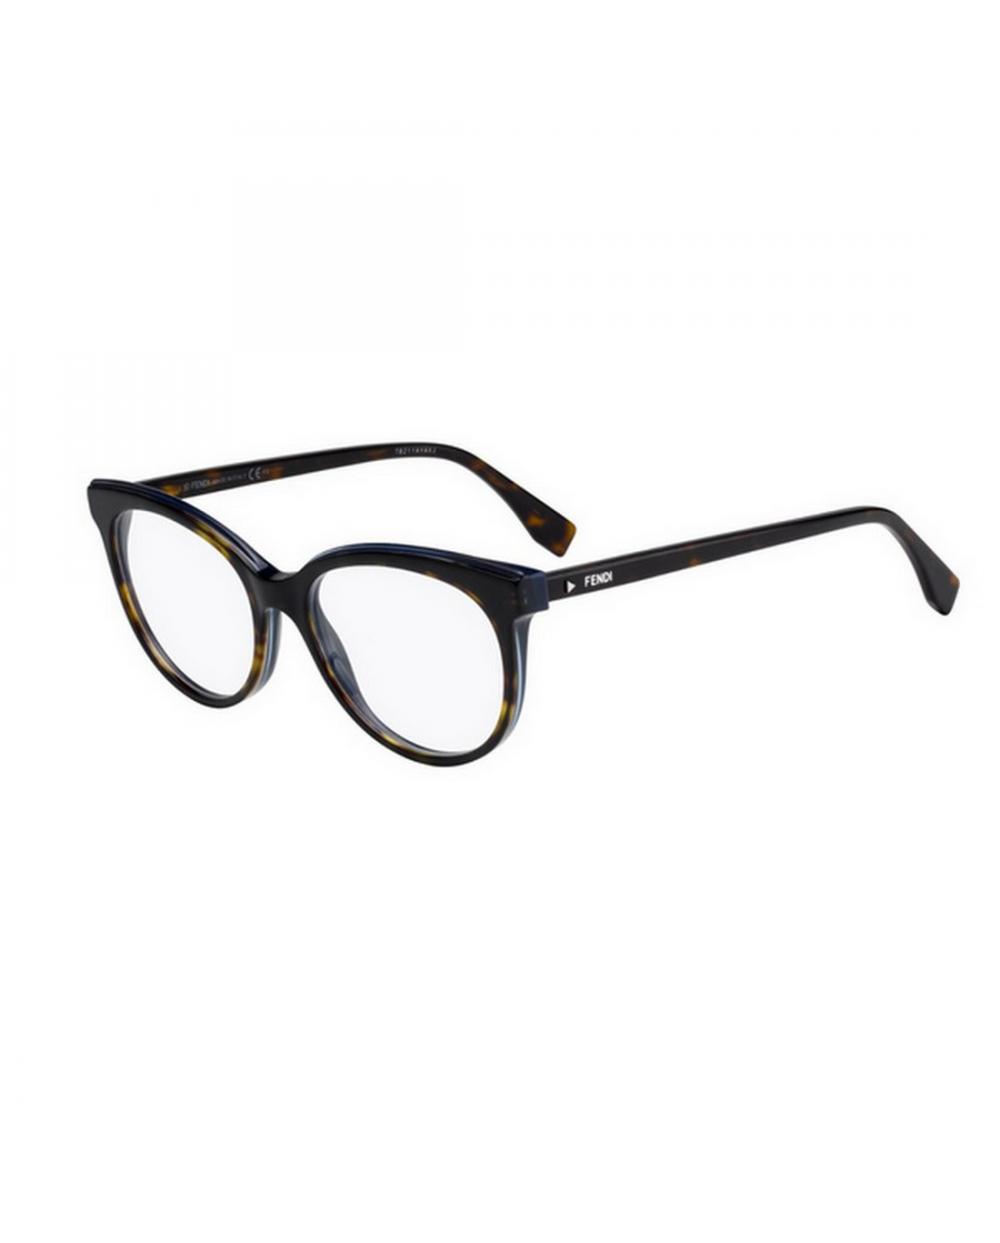 Lunettes les lunettes Fendi FF 0254 emballage d'origine garantie Italie